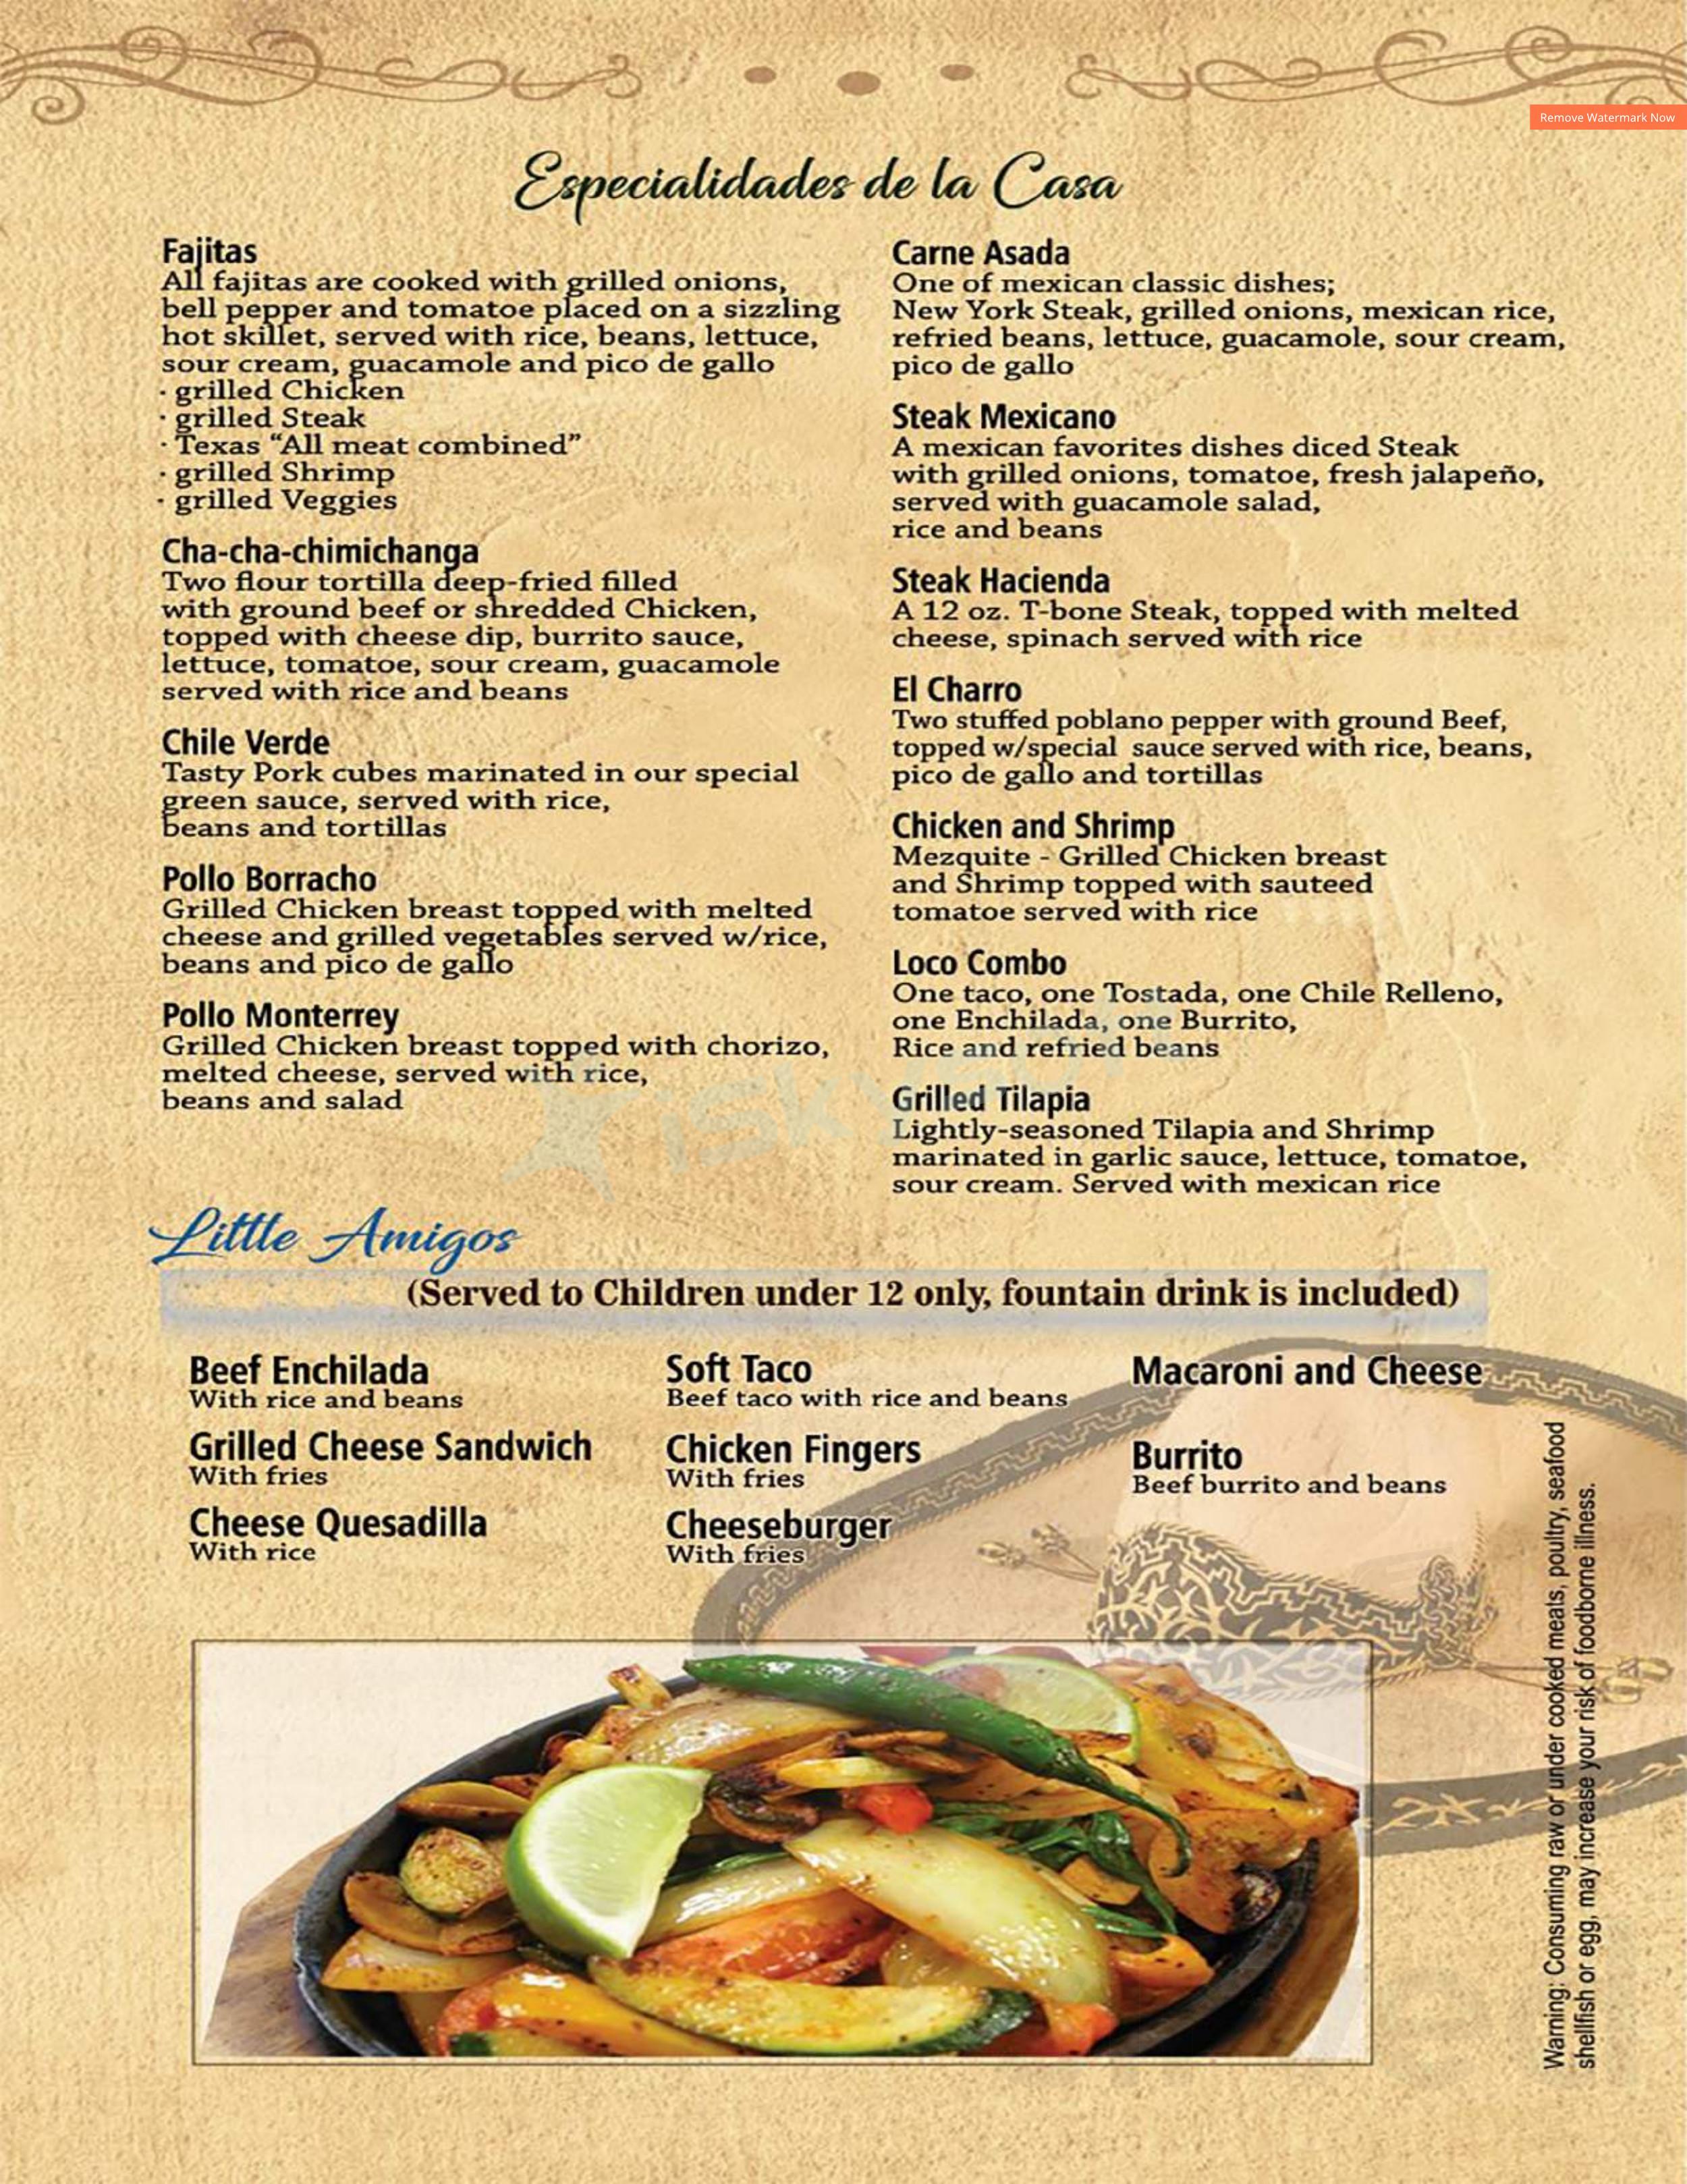 Habanero S Mexican Grill And Bar Menu In Bradenton Florida Usa